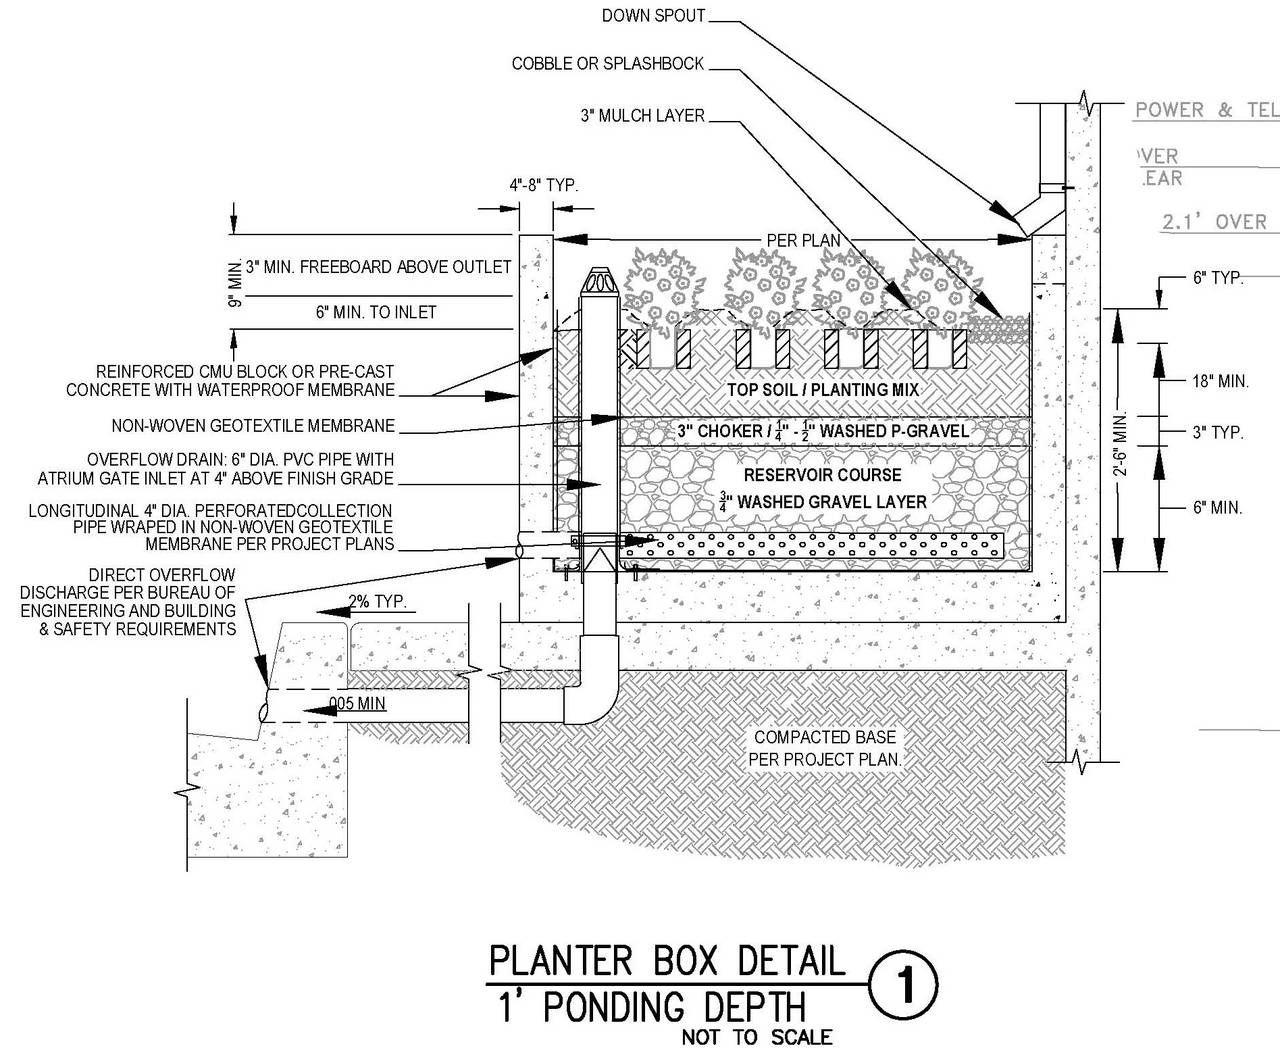 Los Angeles City Susmp Planter Box B W Engineering And Design Blog Bwengr Com Planter Boxes Concrete Planter Boxes Building Planter Boxes